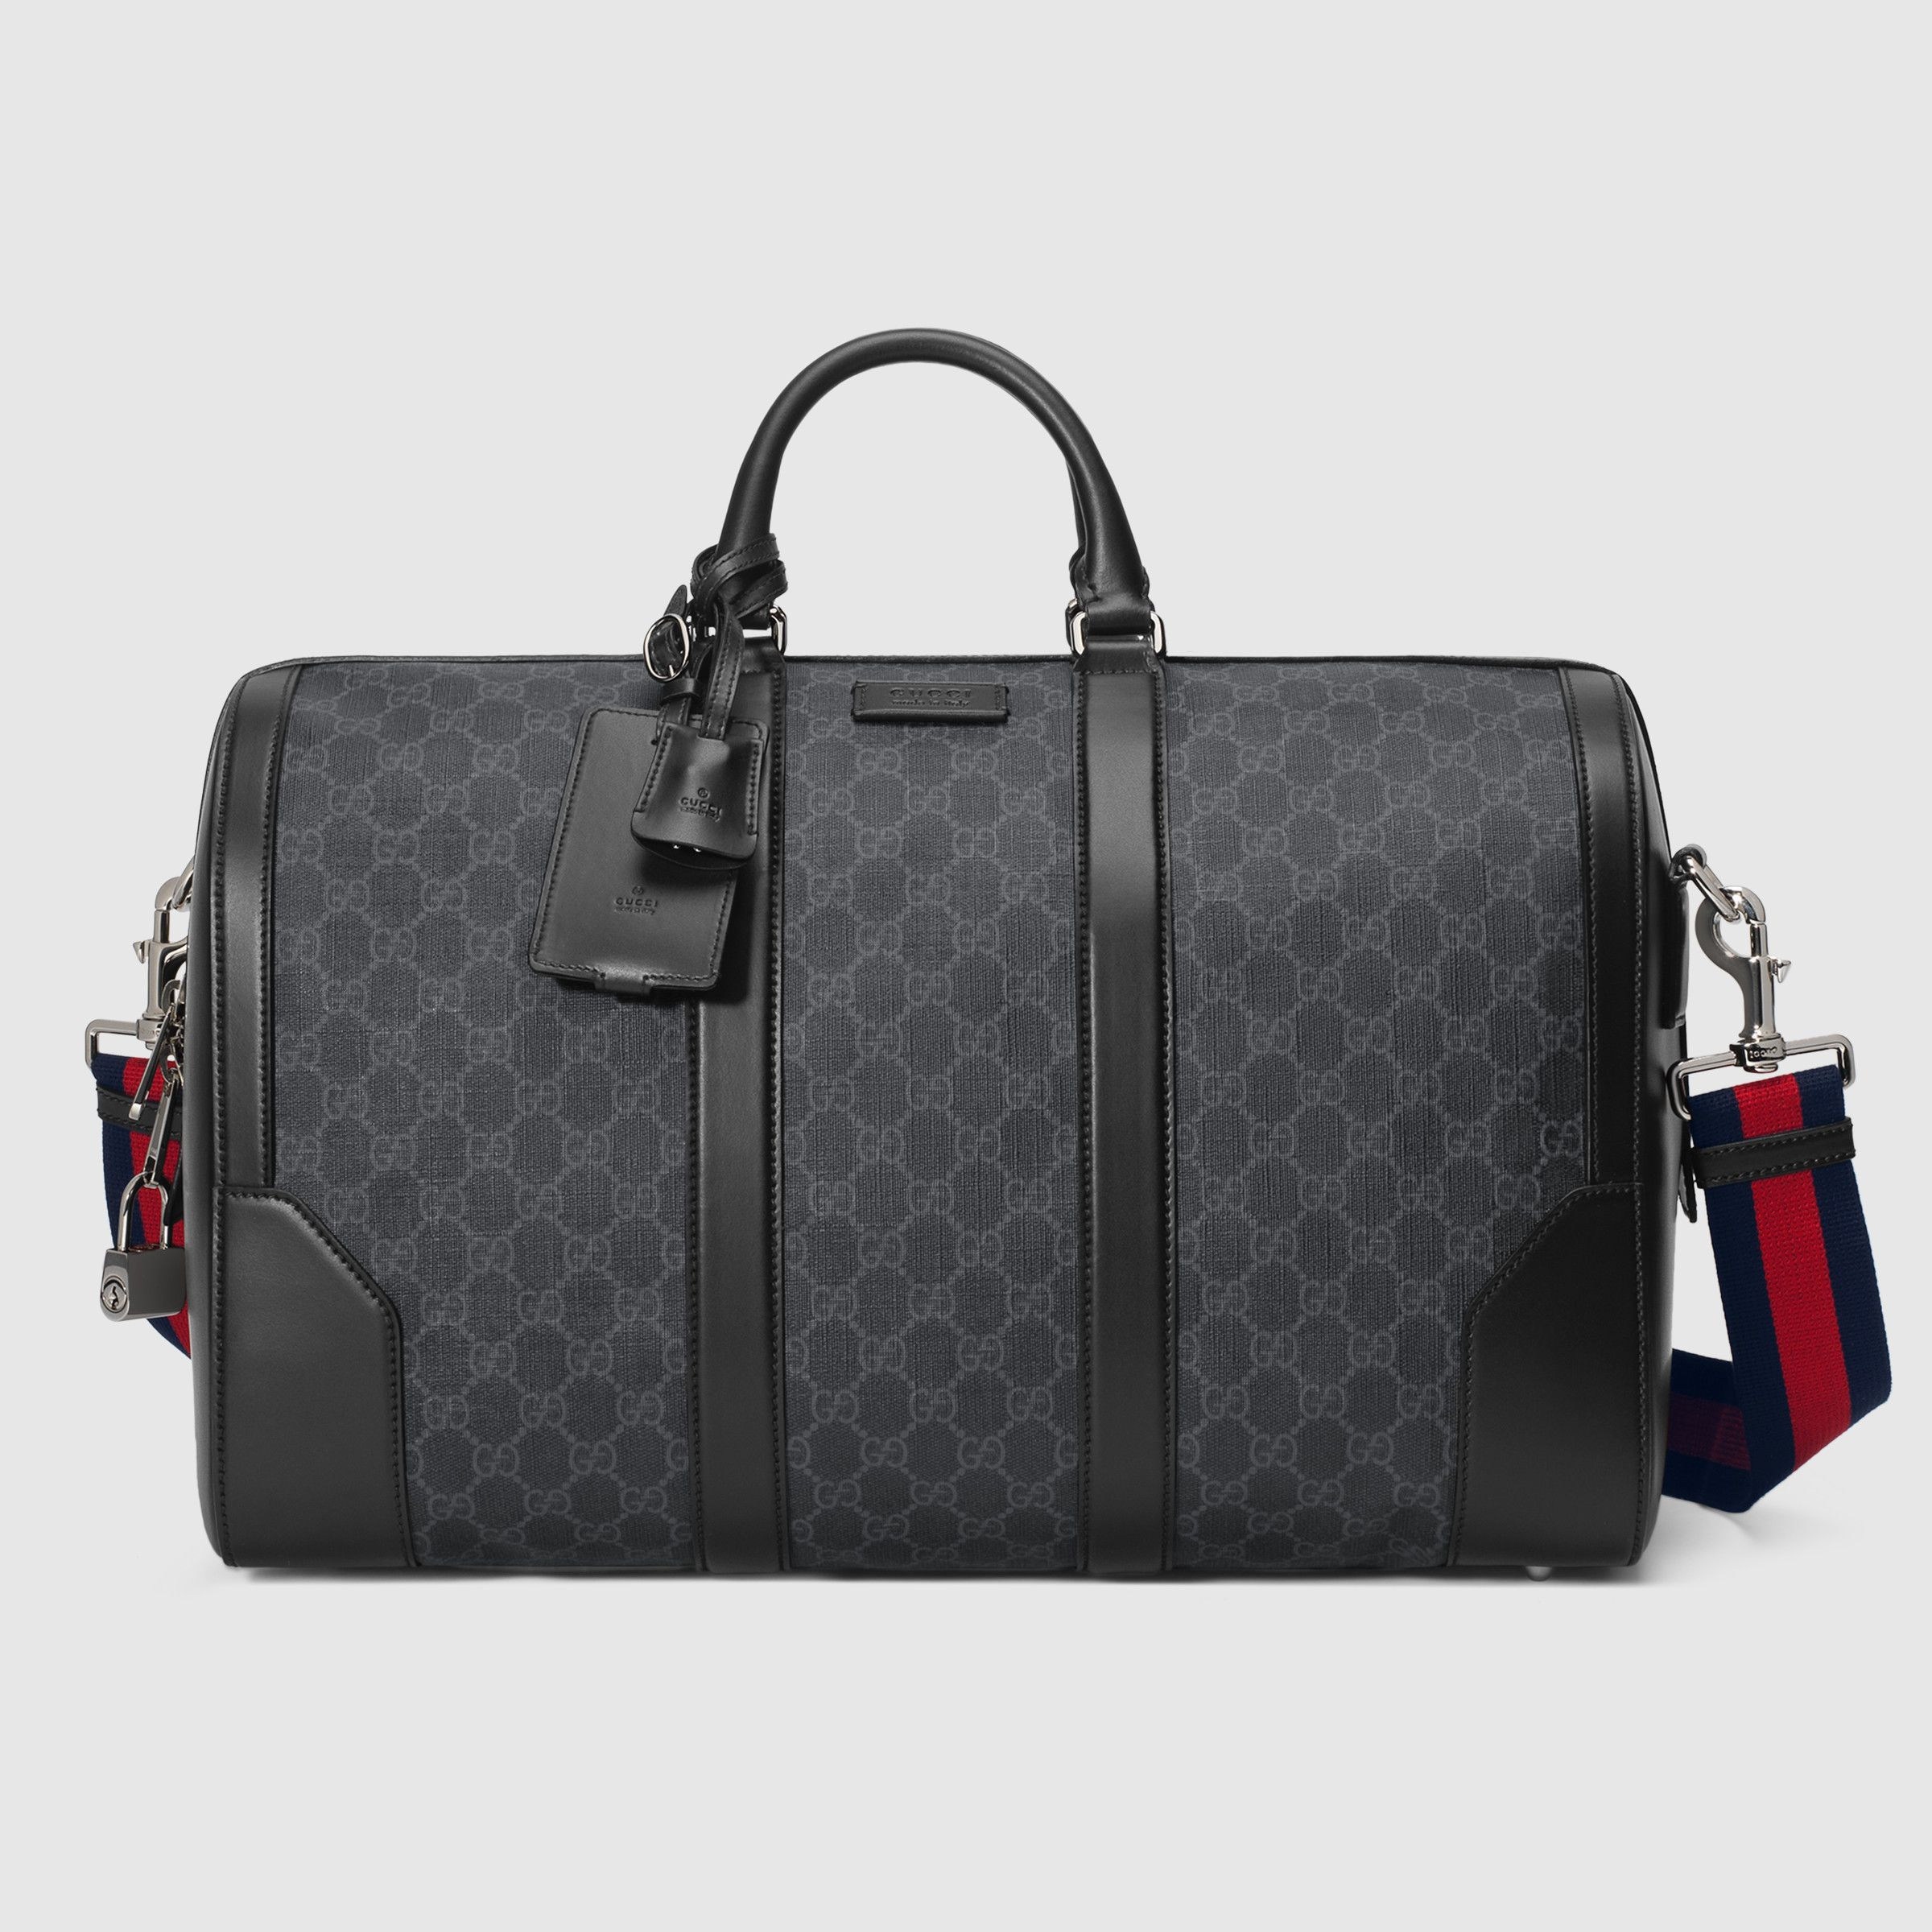 353387d0cb5 Bulletblocker NIJ IIIA Bulletproof Gucci Signature Duffle in 2019 ...